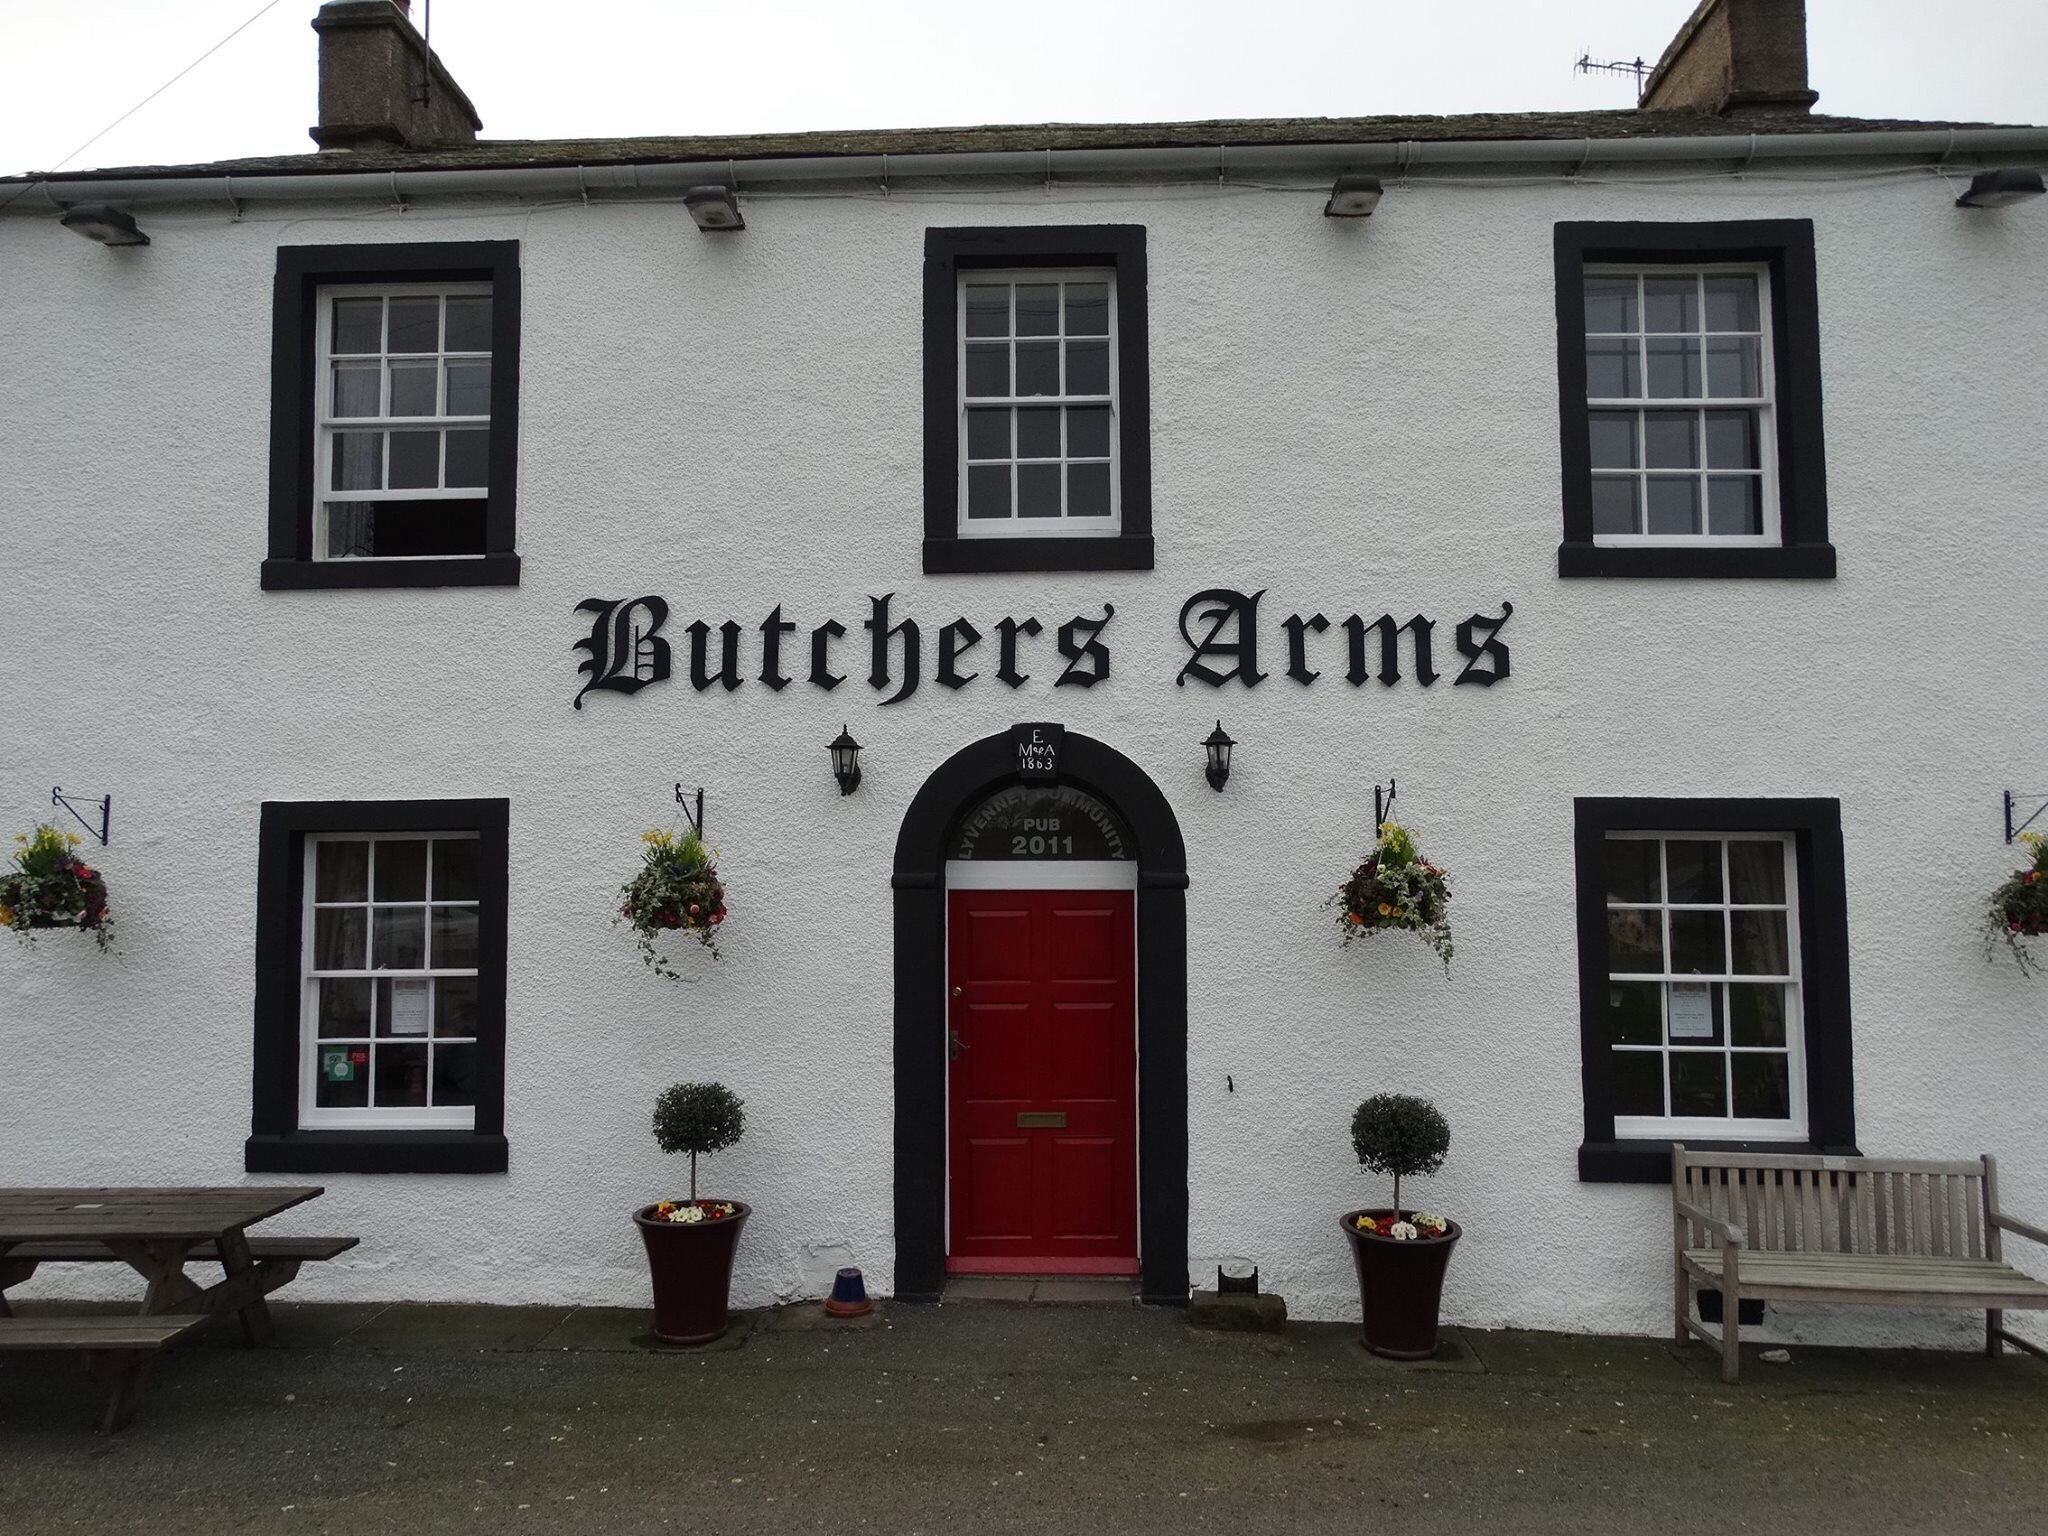 Butchers Arms